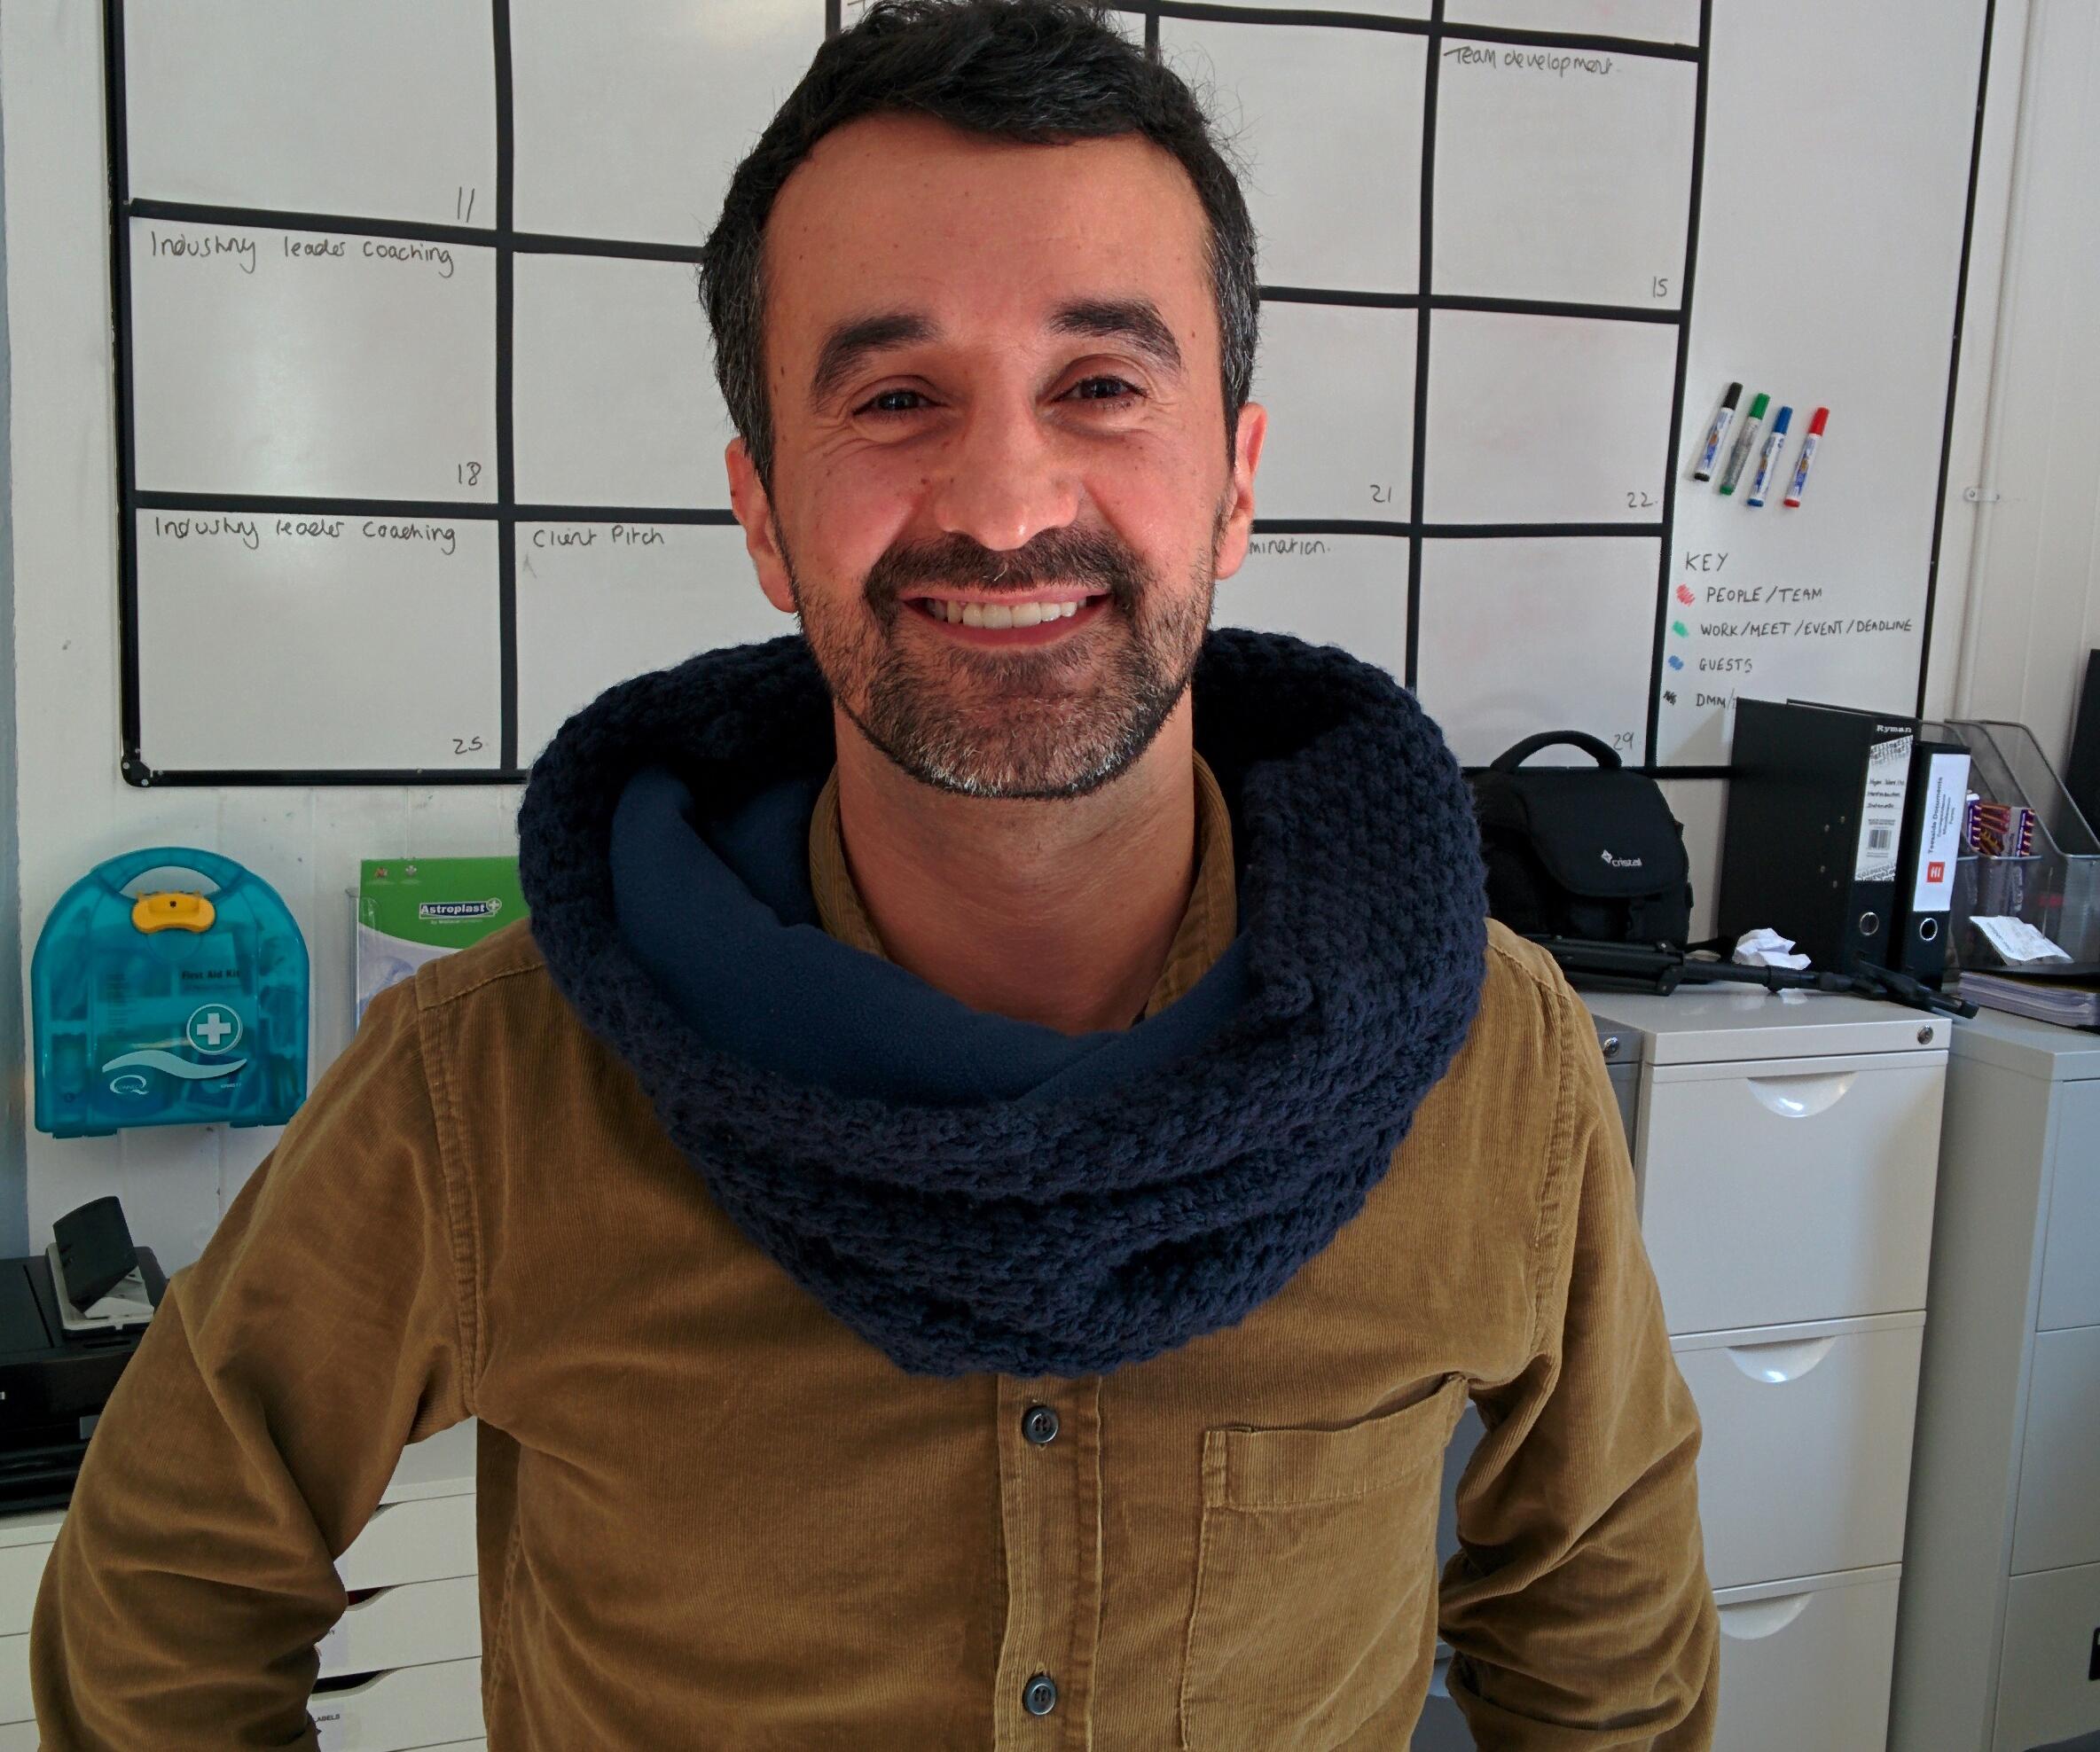 DanielSantos